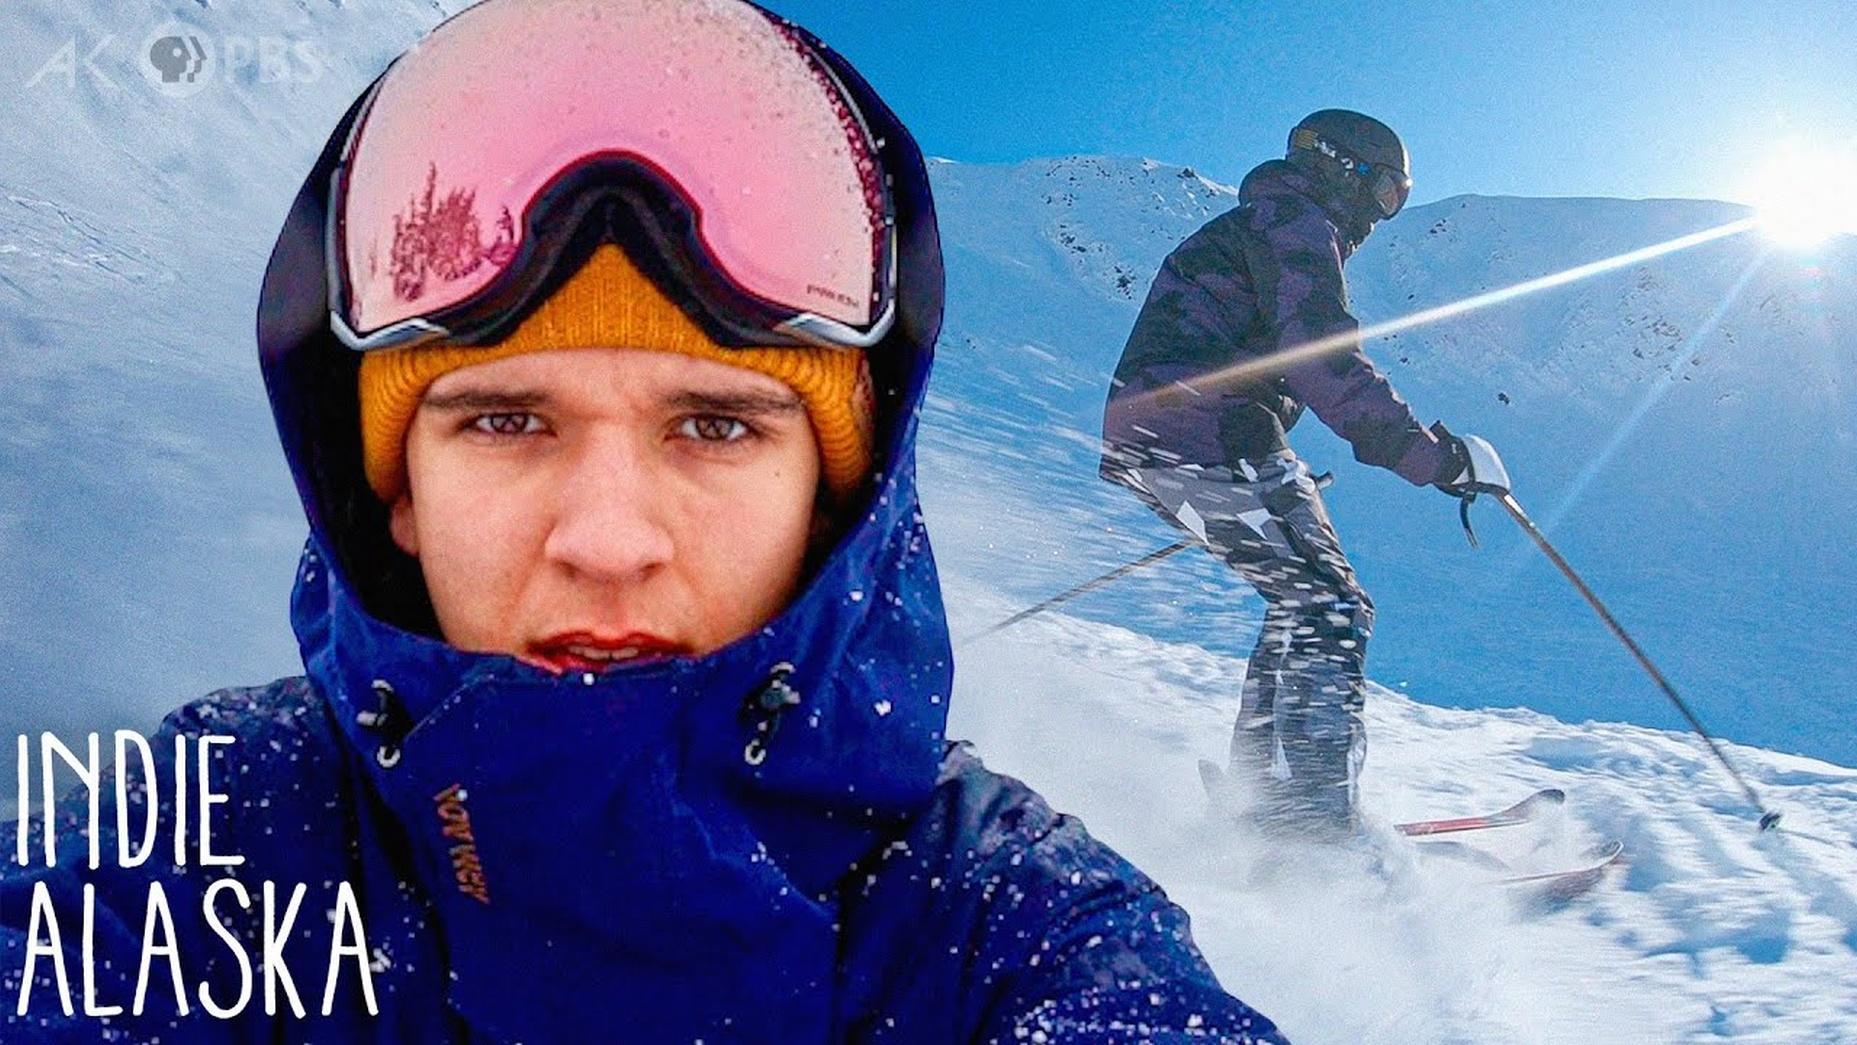 Skiing Alaska's extreme slopes with videographer Luka Bees